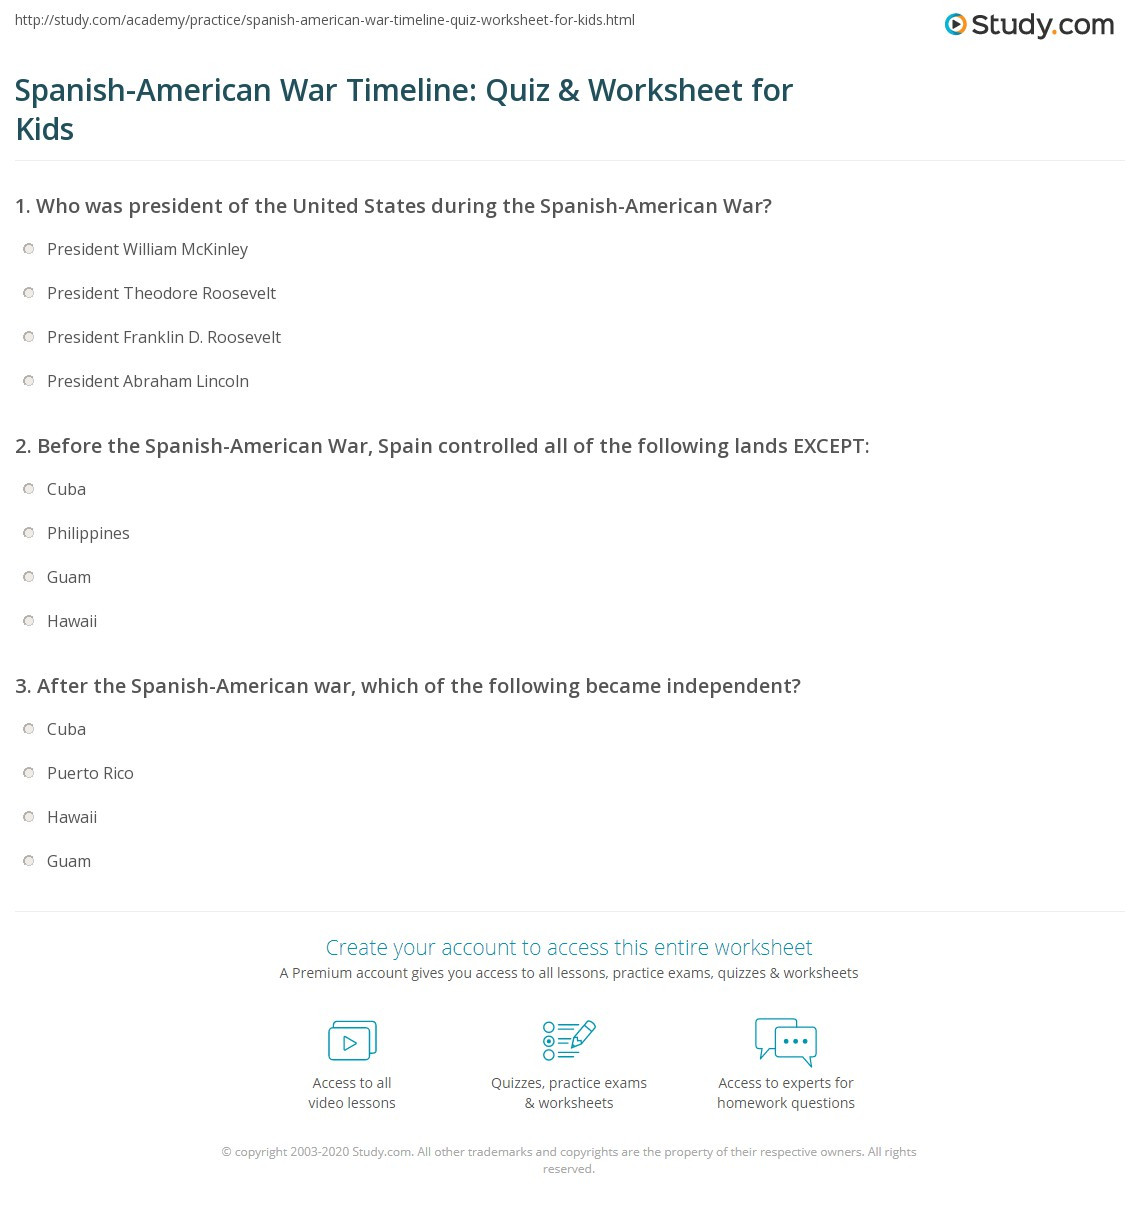 Spanish American War Worksheet Spanish American War Timeline Quiz & Worksheet for Kids